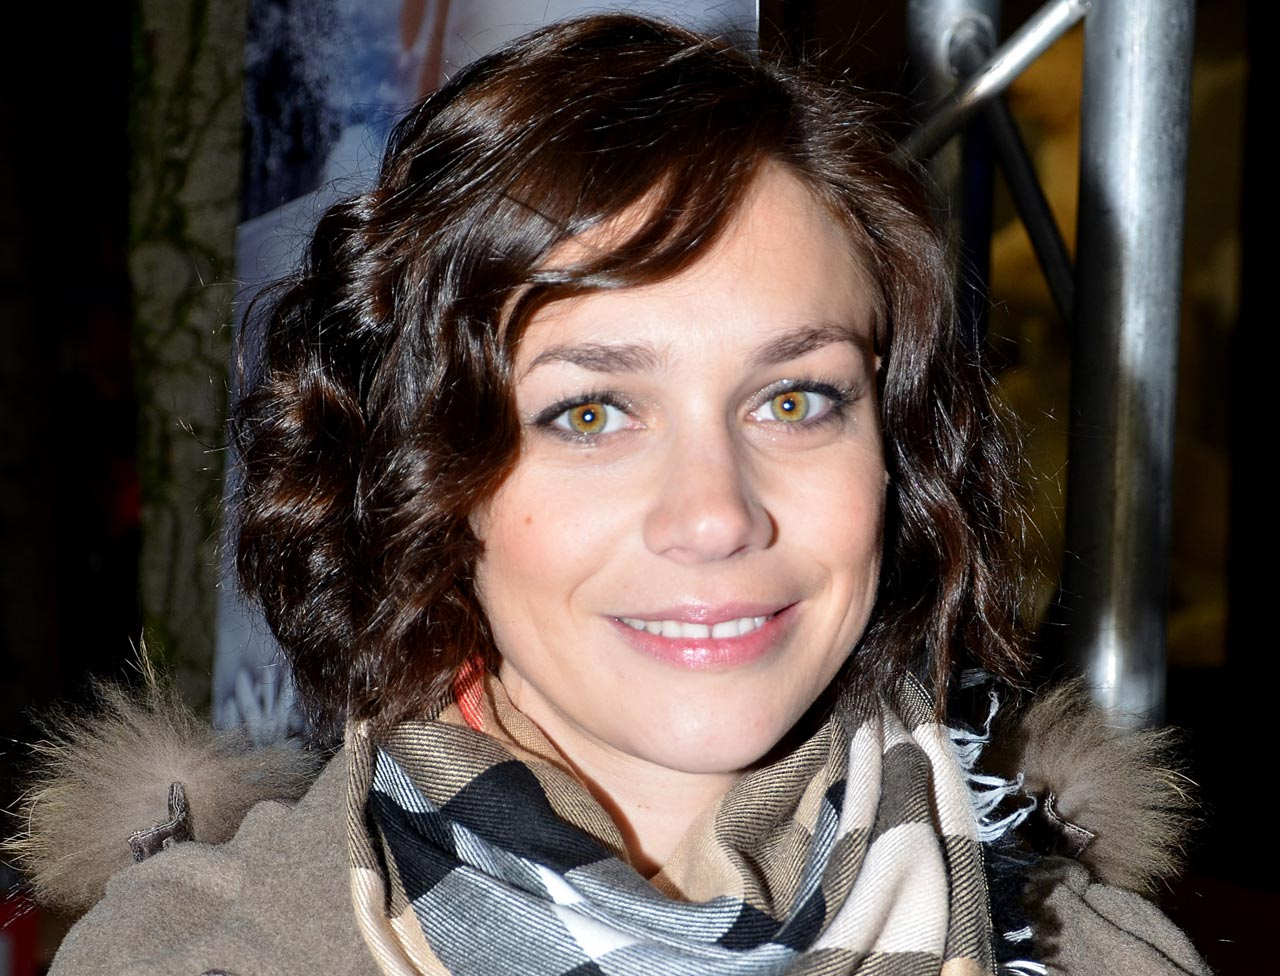 Nathalie p chalat ne trompe pas jean dujardin vivreaupresent for La copine de jean dujardin